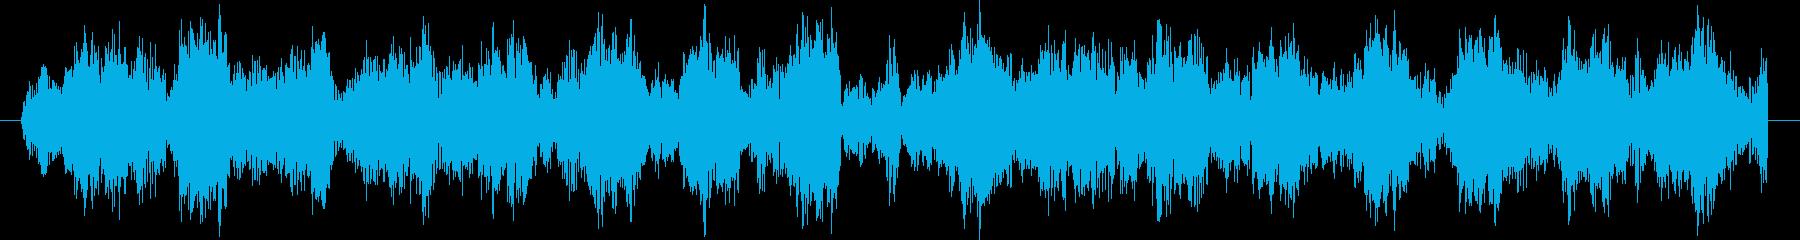 ポリポリポリポリポリポリホ…の再生済みの波形